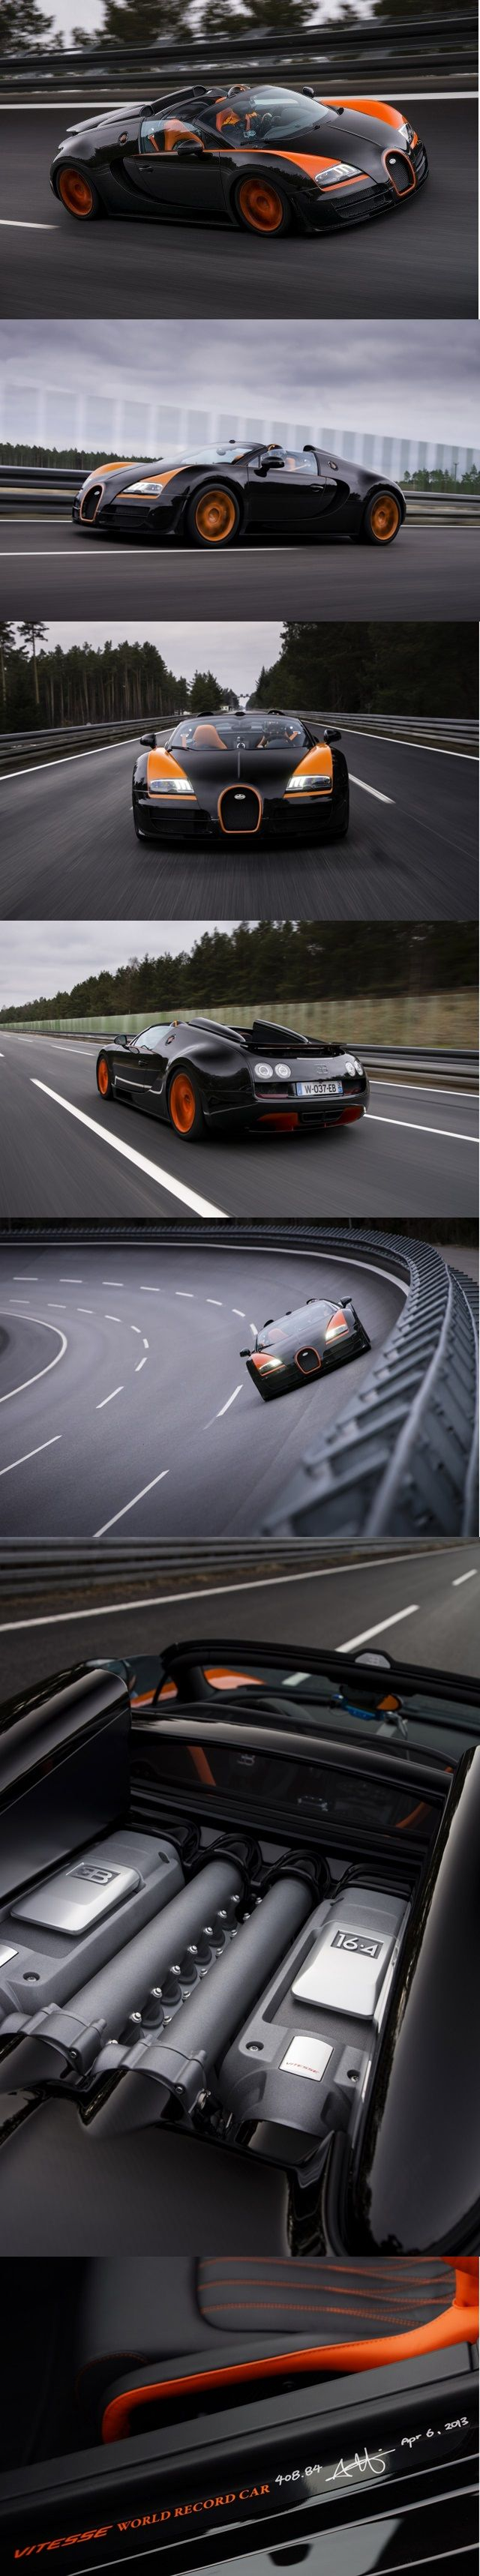 f62a6ffa65f41c62d10fe71aed115d03 Terrific Bugatti Veyron 16.4 Grand Sport Vitesse Prix Cars Trend